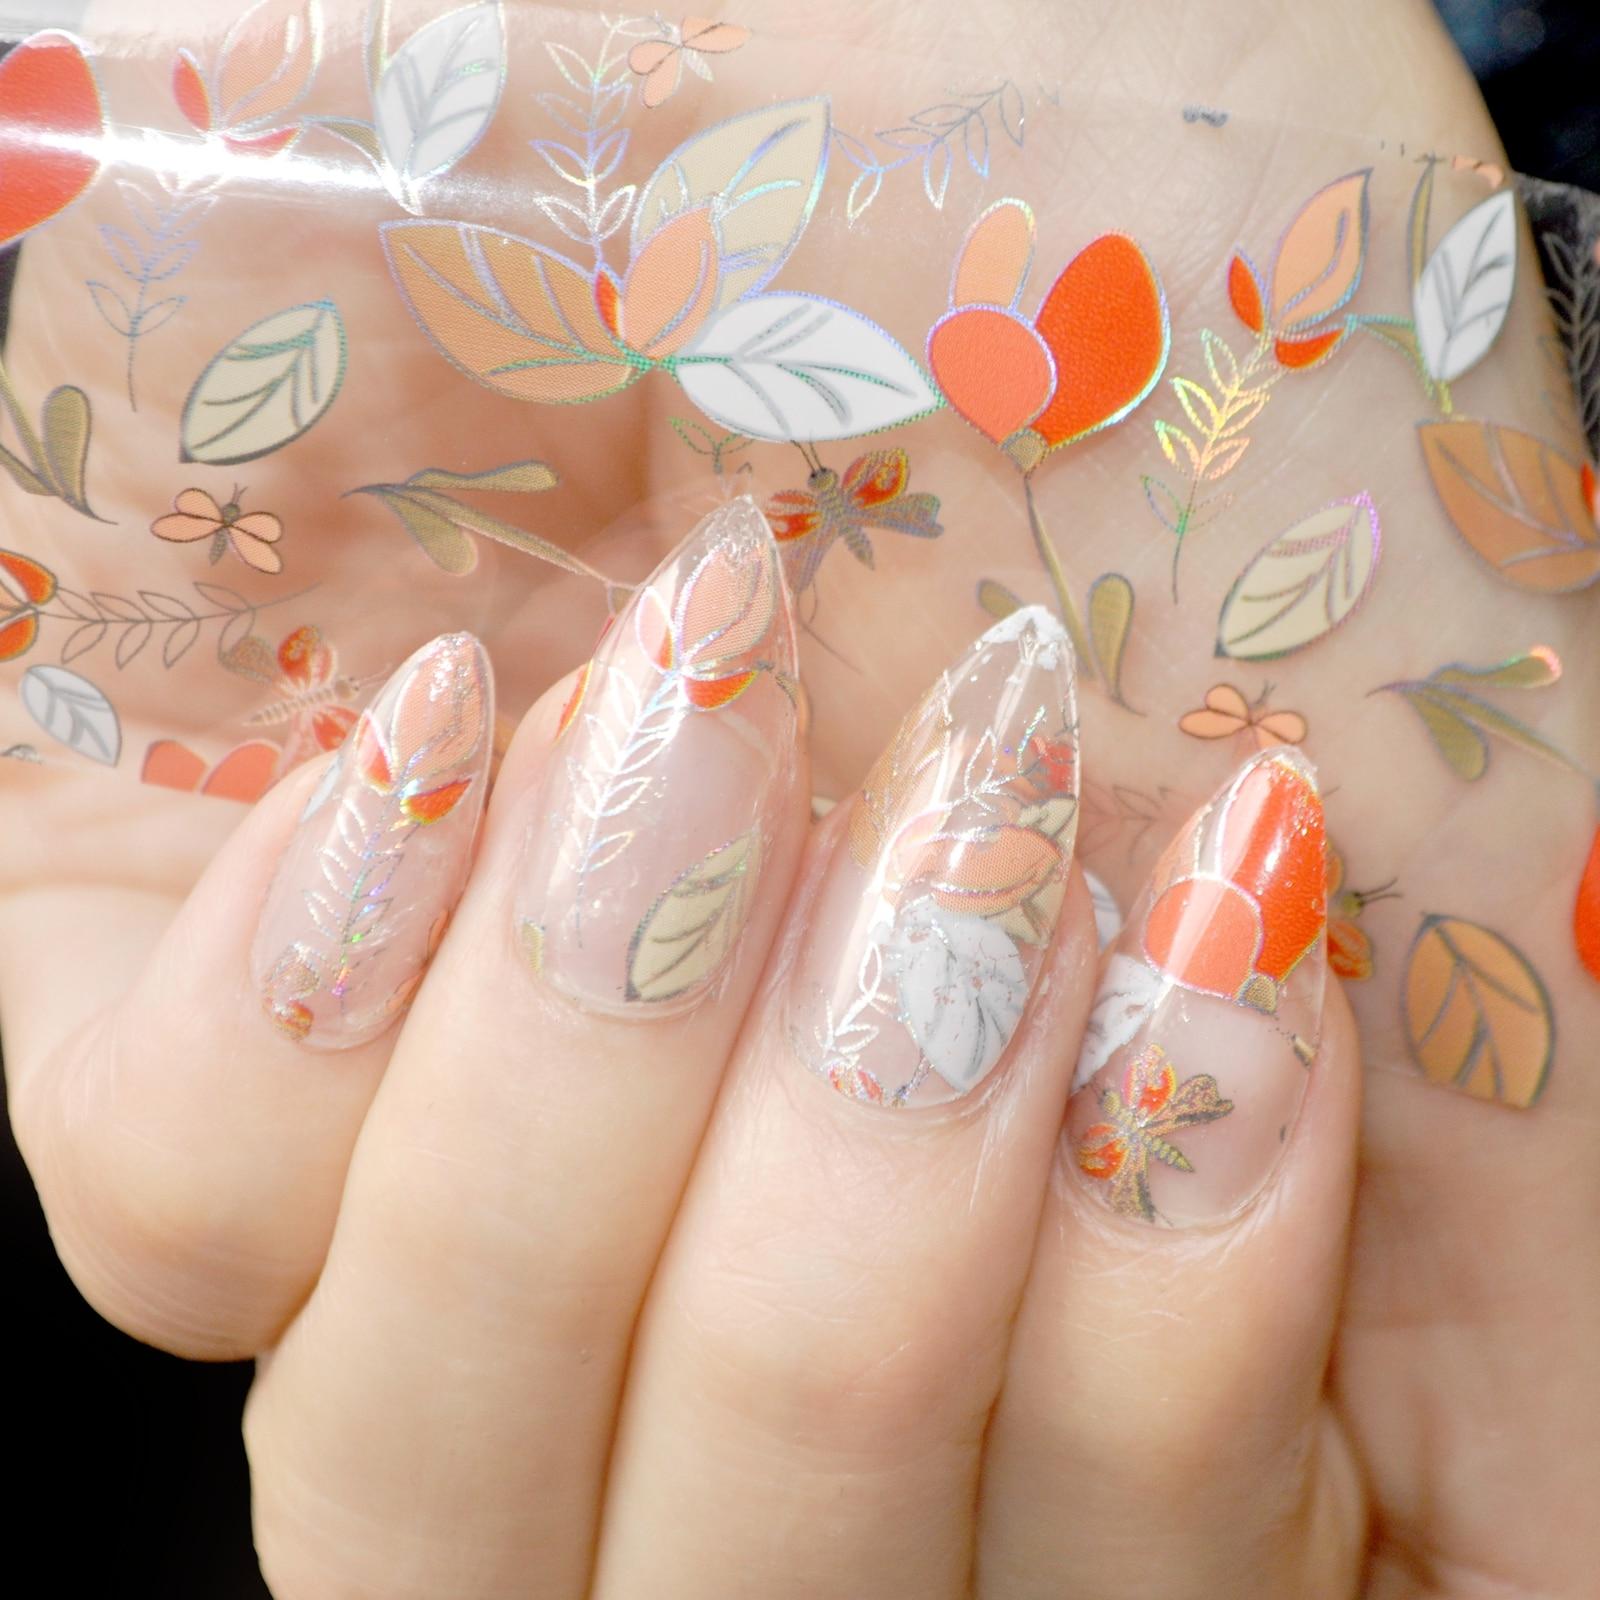 1 piece= 1meter Leaves Design Nail Art Glue Transfer Foil Sticker Laser Leaf Orange White Clear Base Nail Decoration Accessories